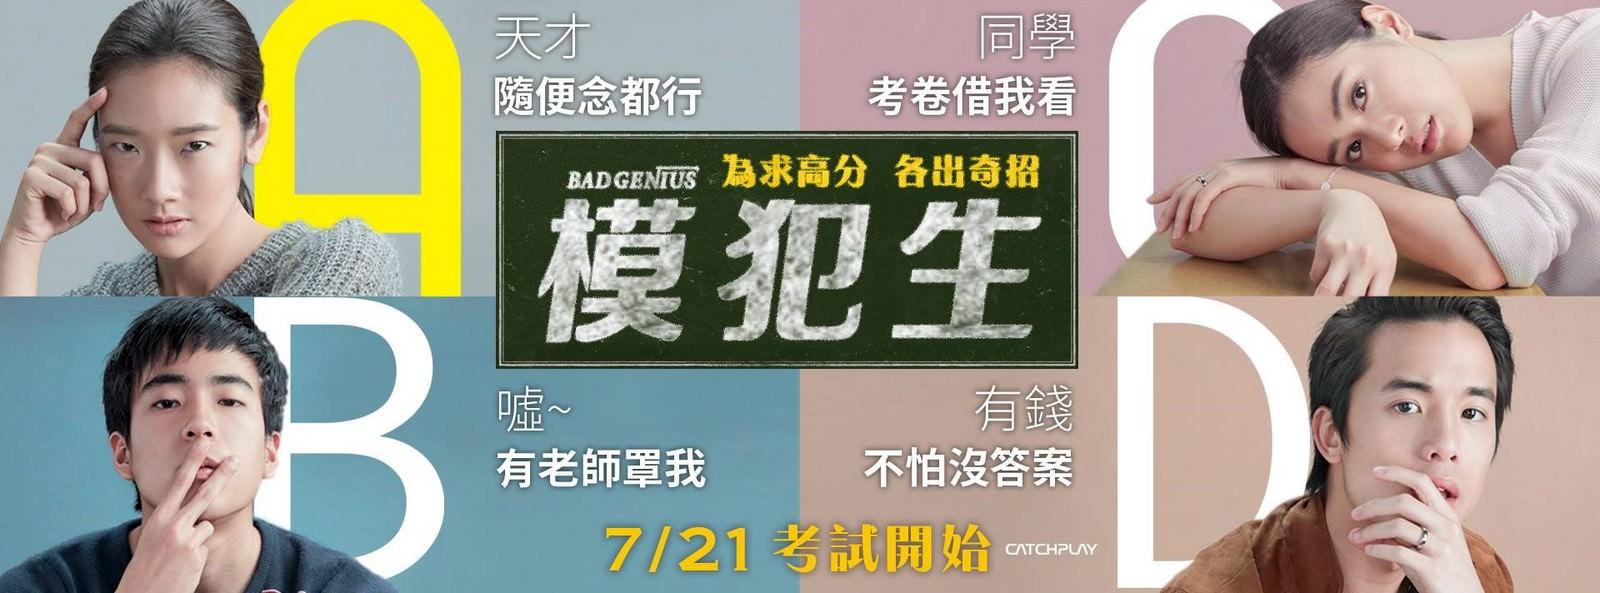 Movie, ฉลาดเกมส์โกง(泰國, 2017年) / 模犯生(台灣) / 天才枪手(中國) / 出貓特攻隊(香港) / Bad Genius(英文), 電影海報, 台灣, 橫版(非正式)